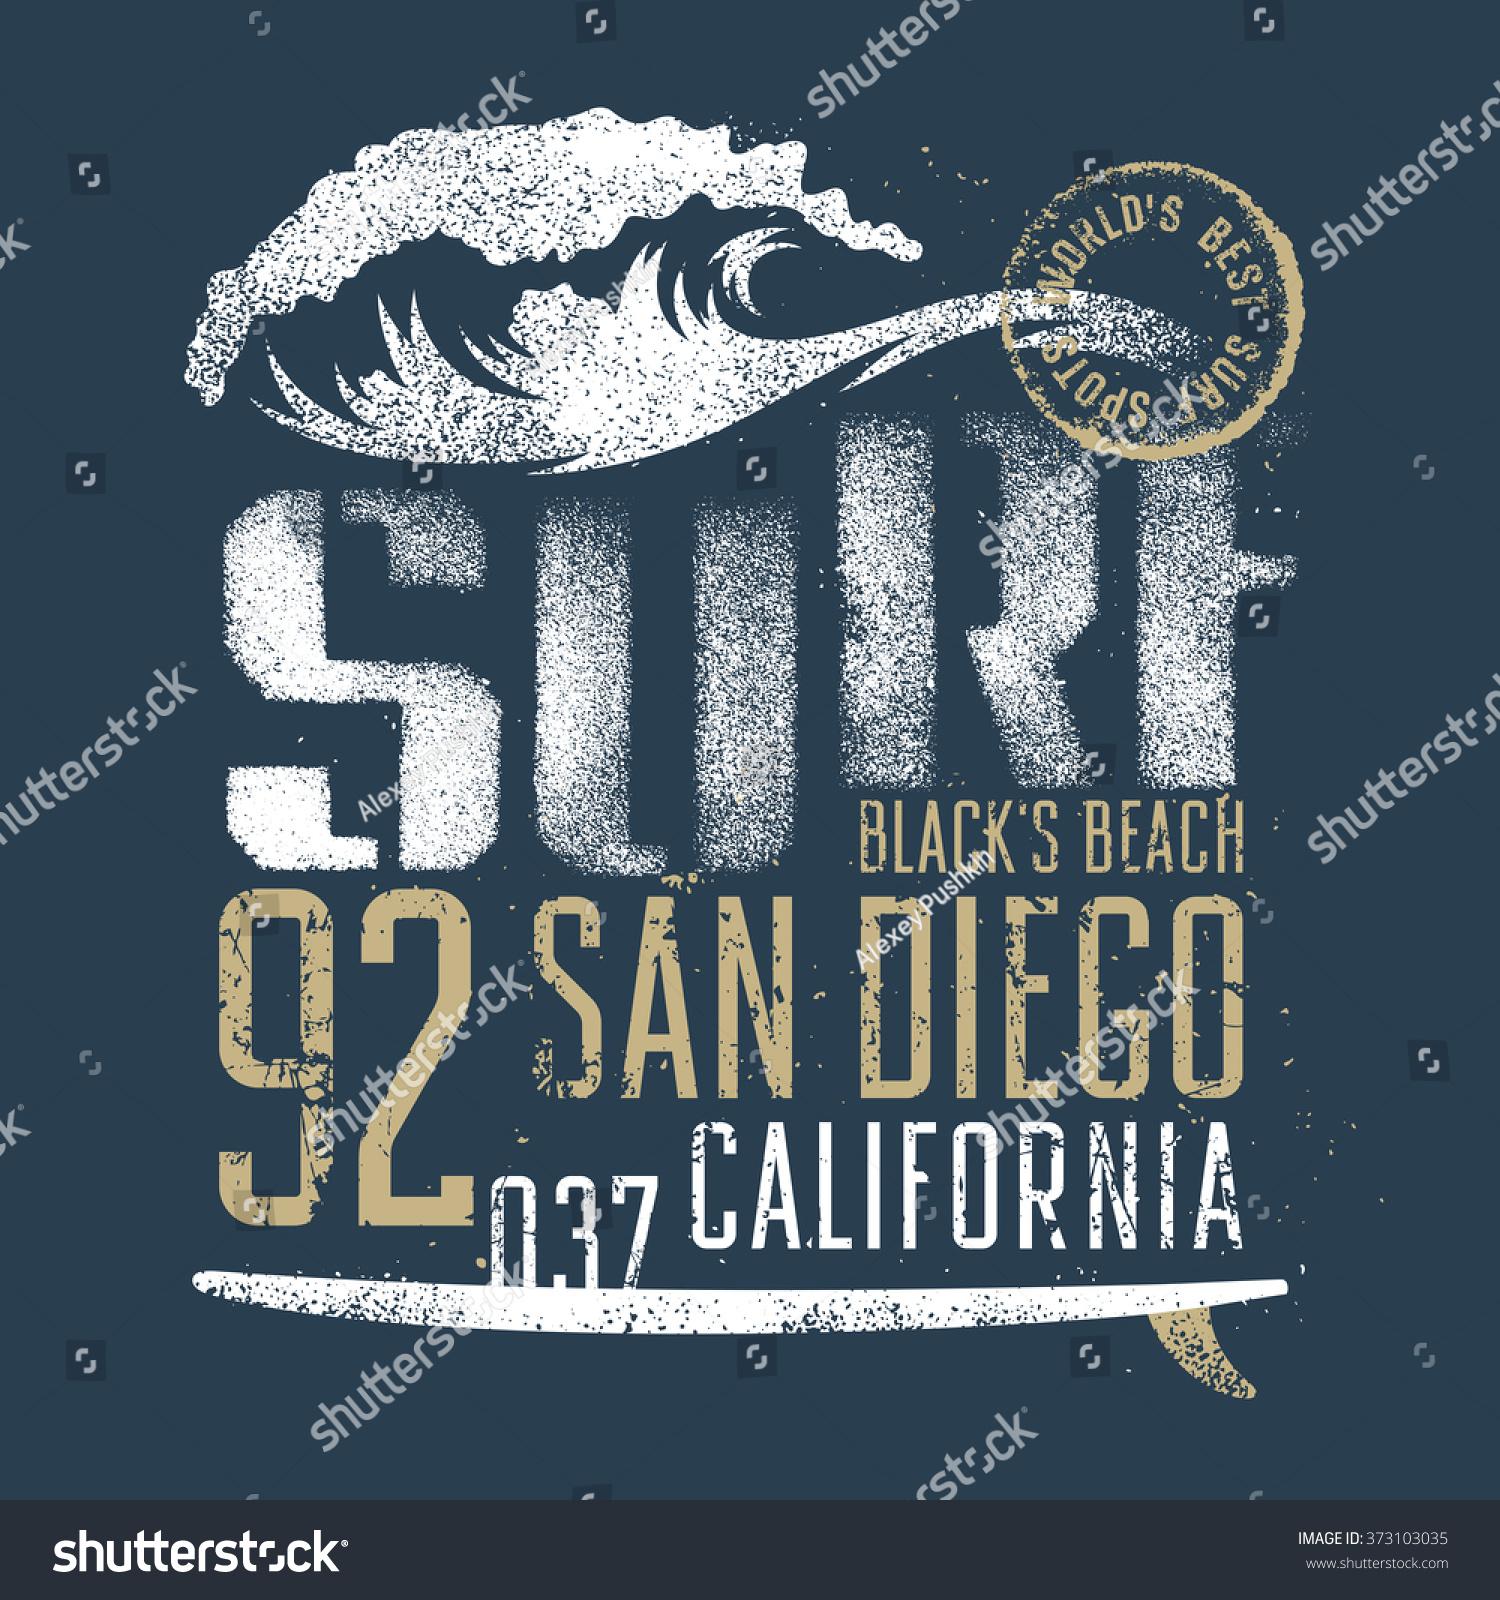 Surfing artwork blacks beach san diego stock vector for Shirt printing san diego